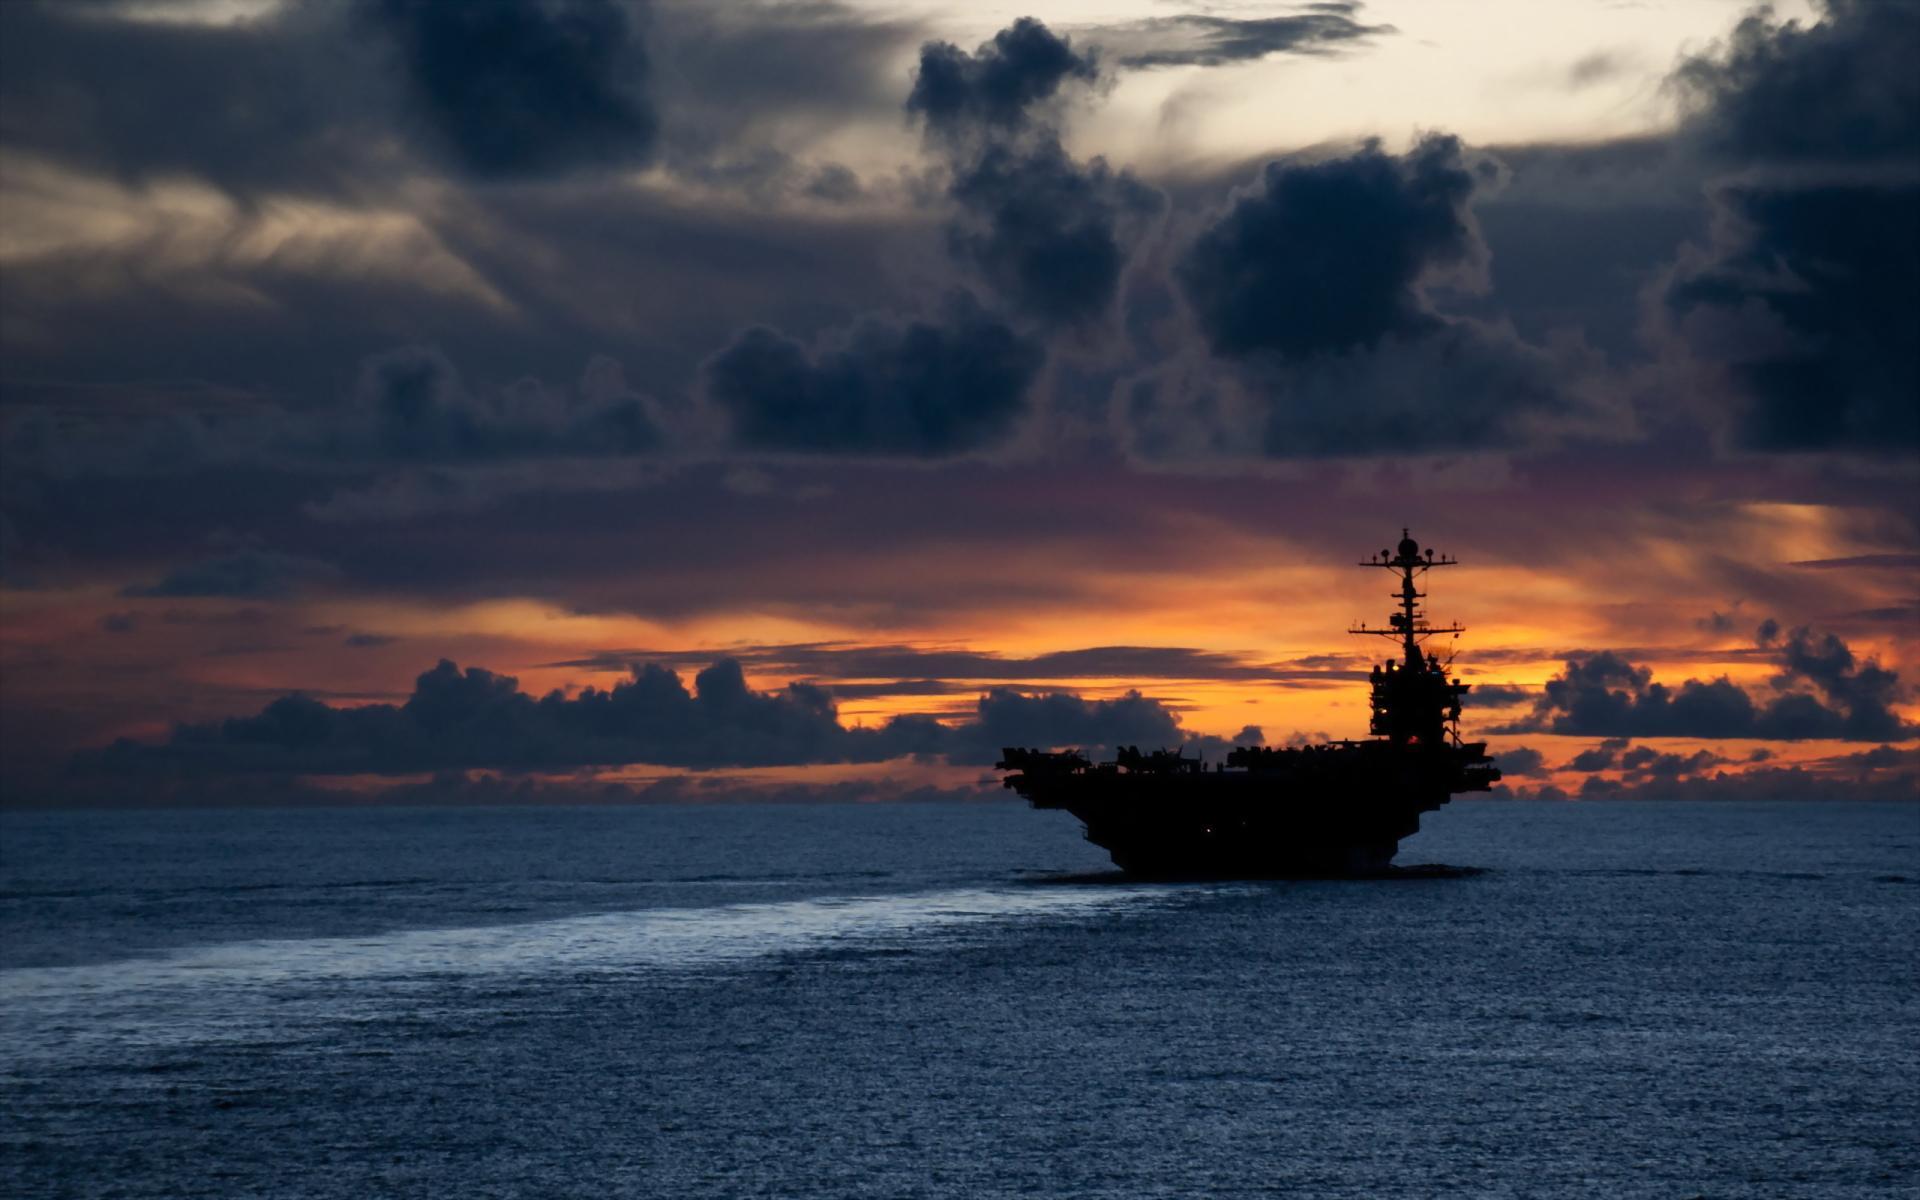 USS George Washington (CVN-73) wallpapers HD quality